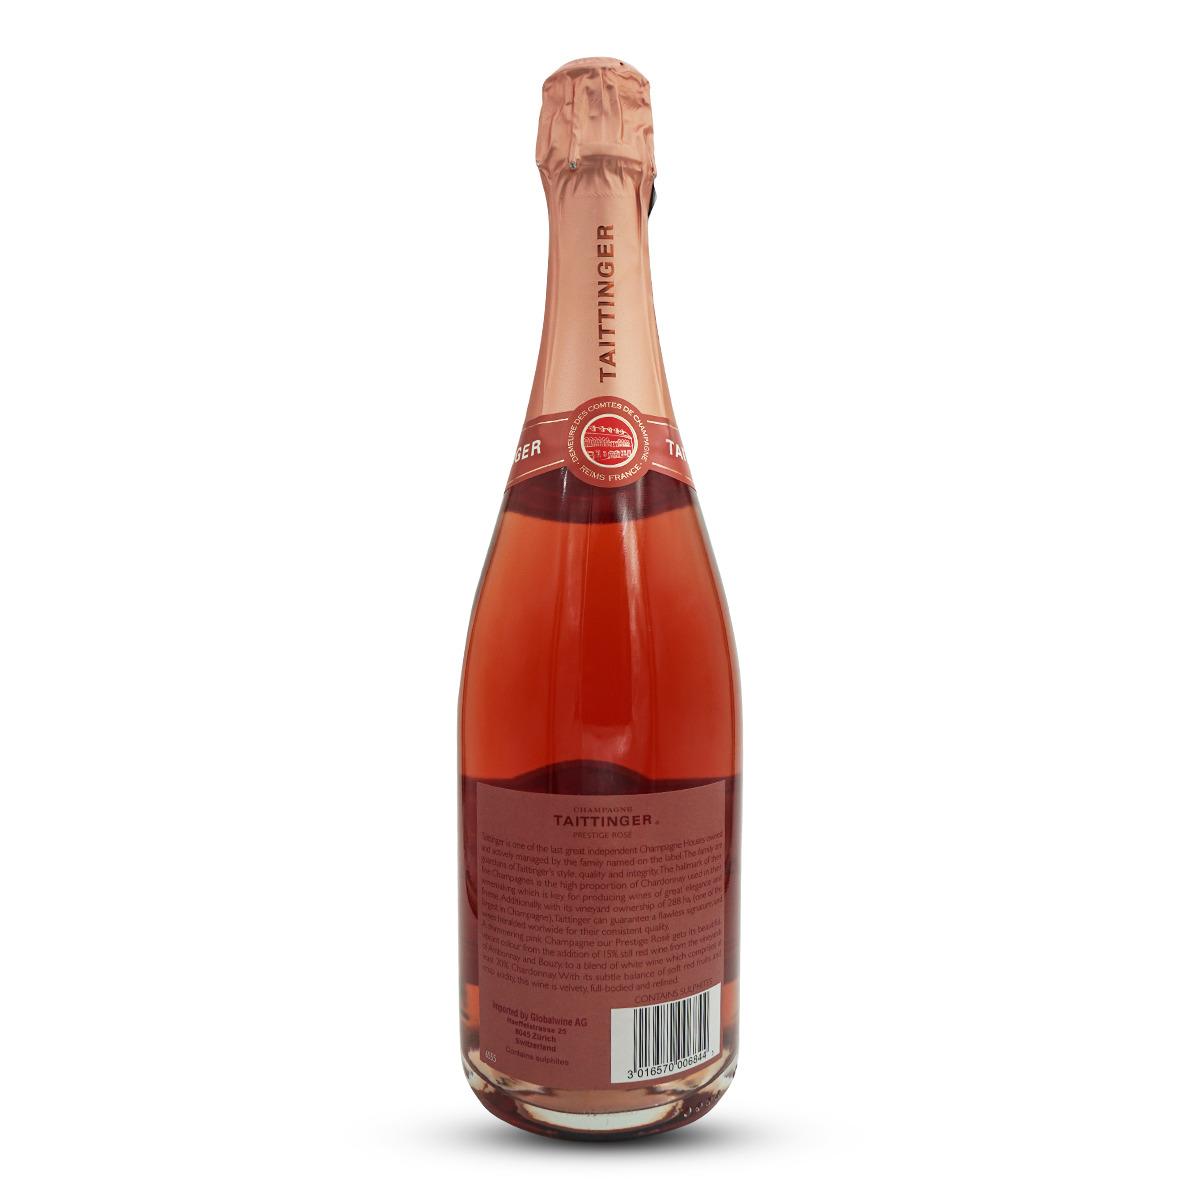 Taittinger Champagne Brut Prestige Rosé AOC